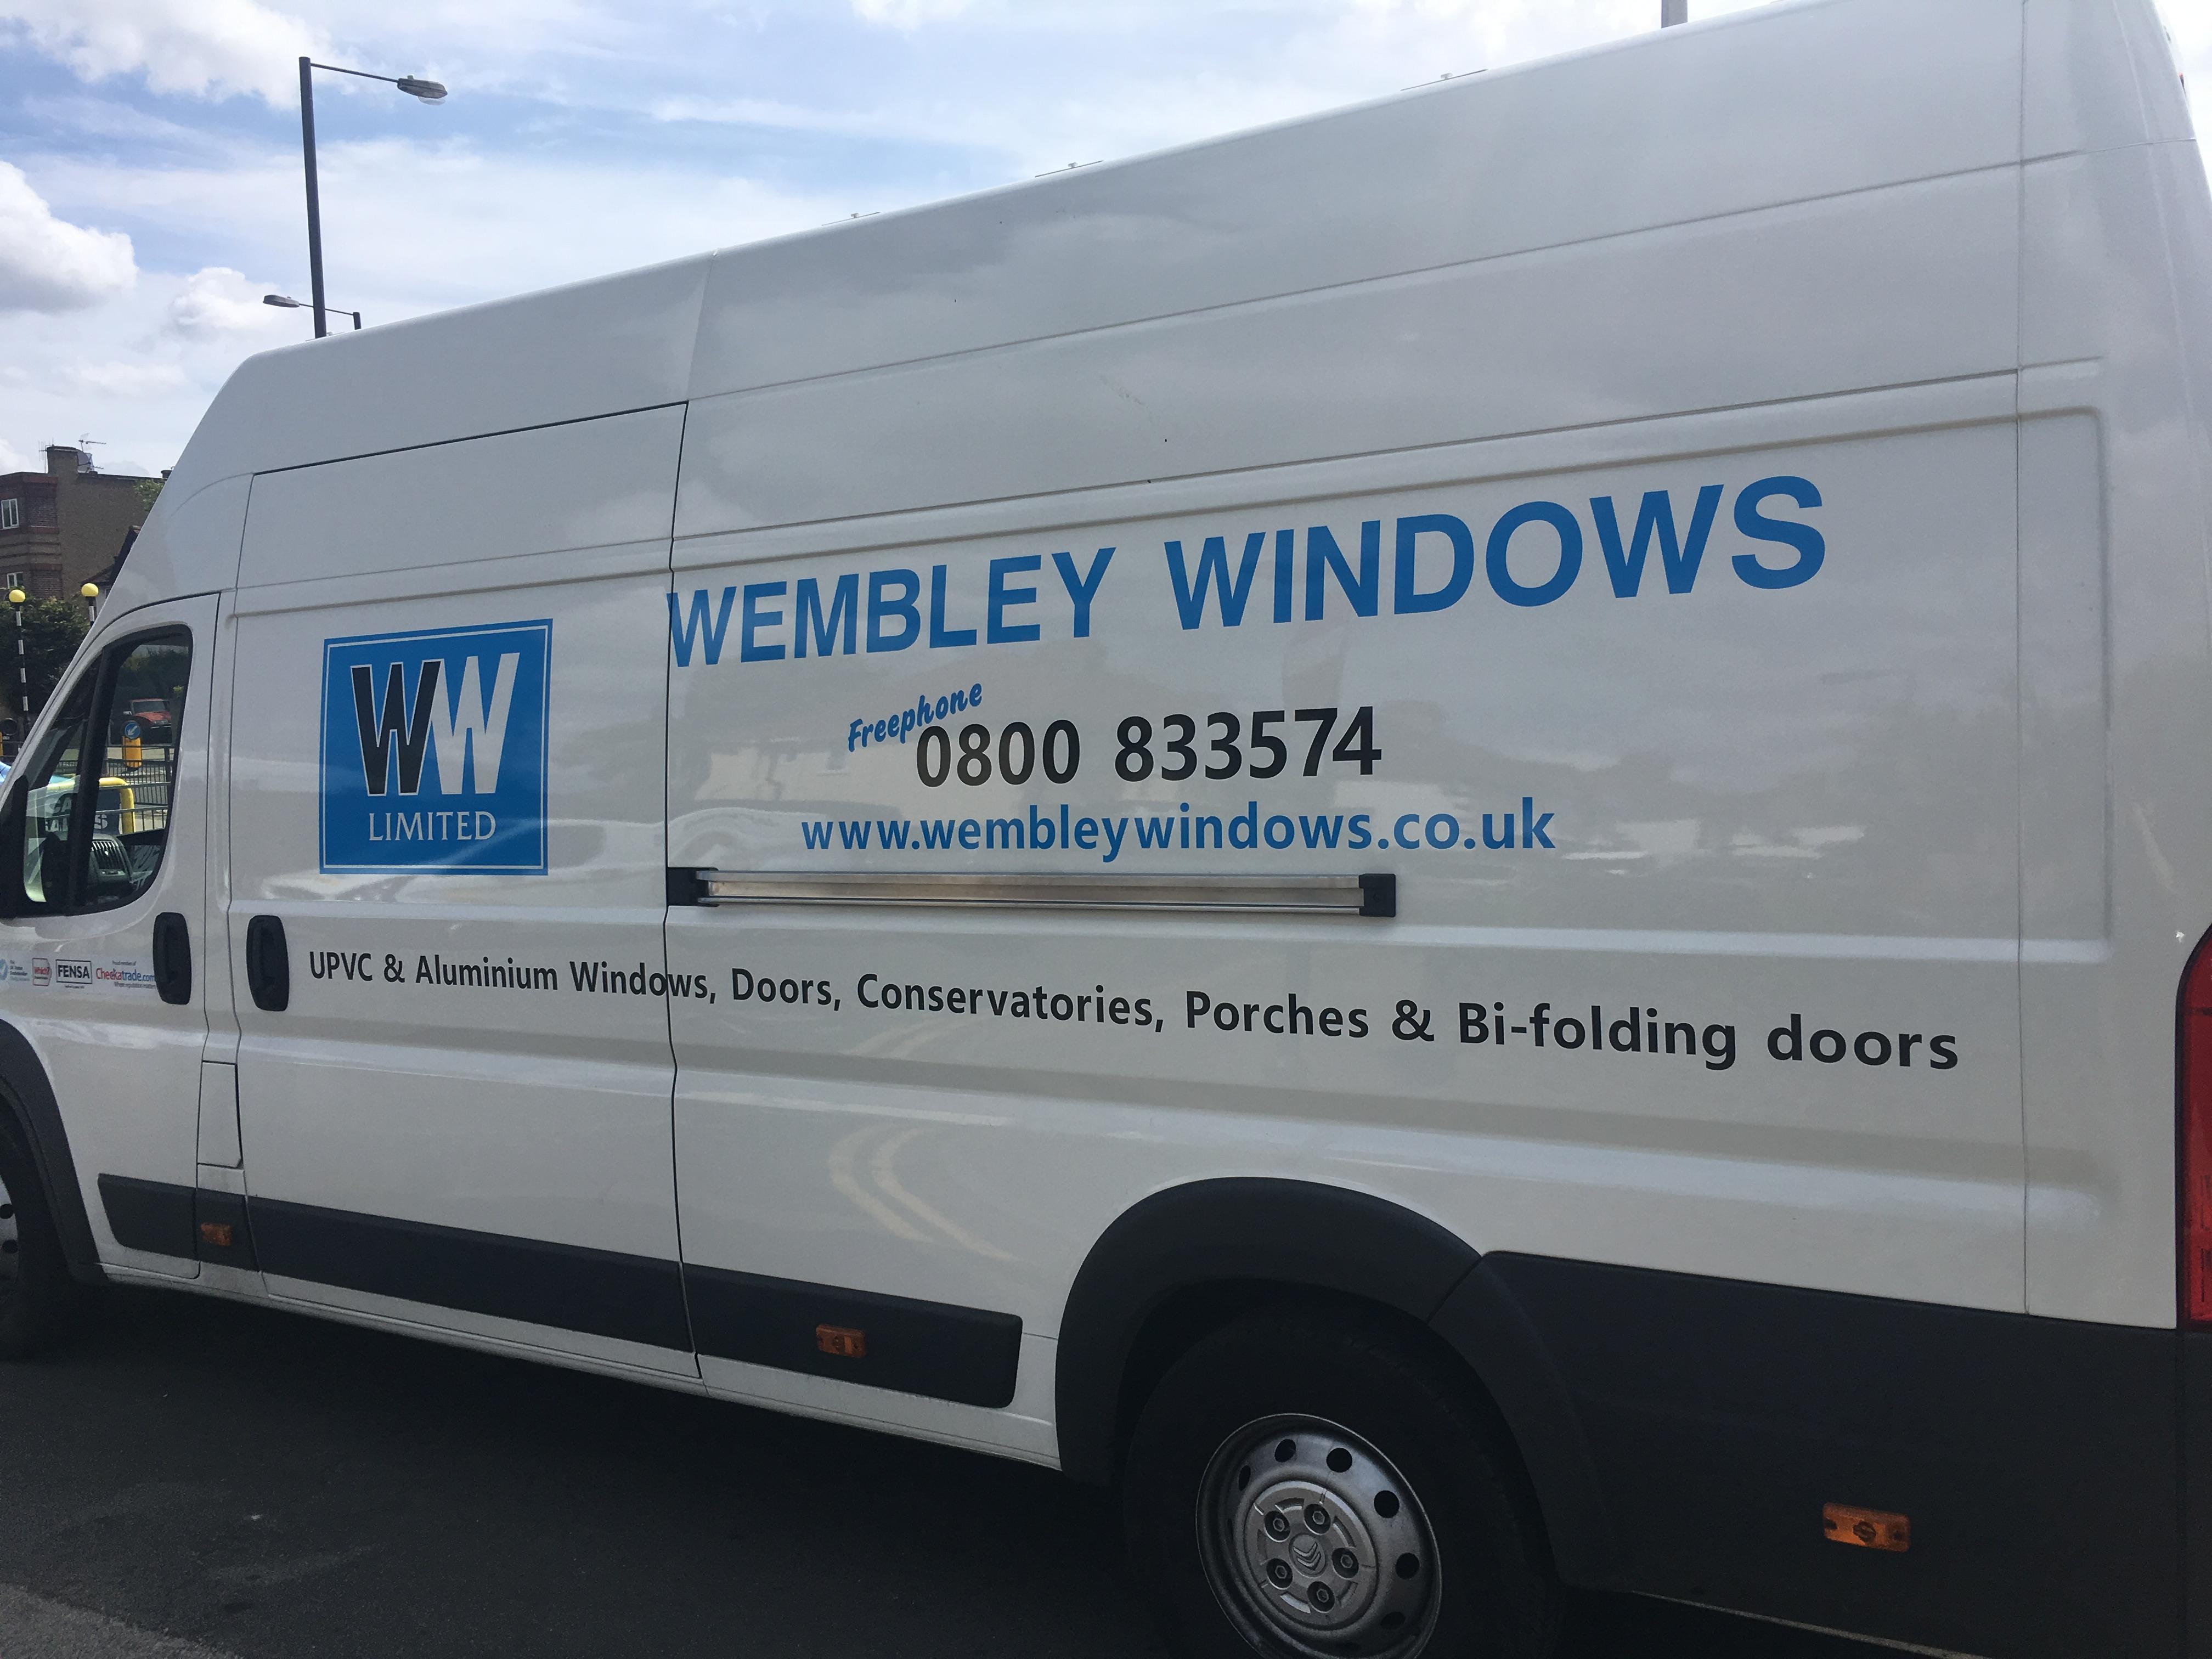 Window Fitter Van Sign Wembley Windows Action Signs